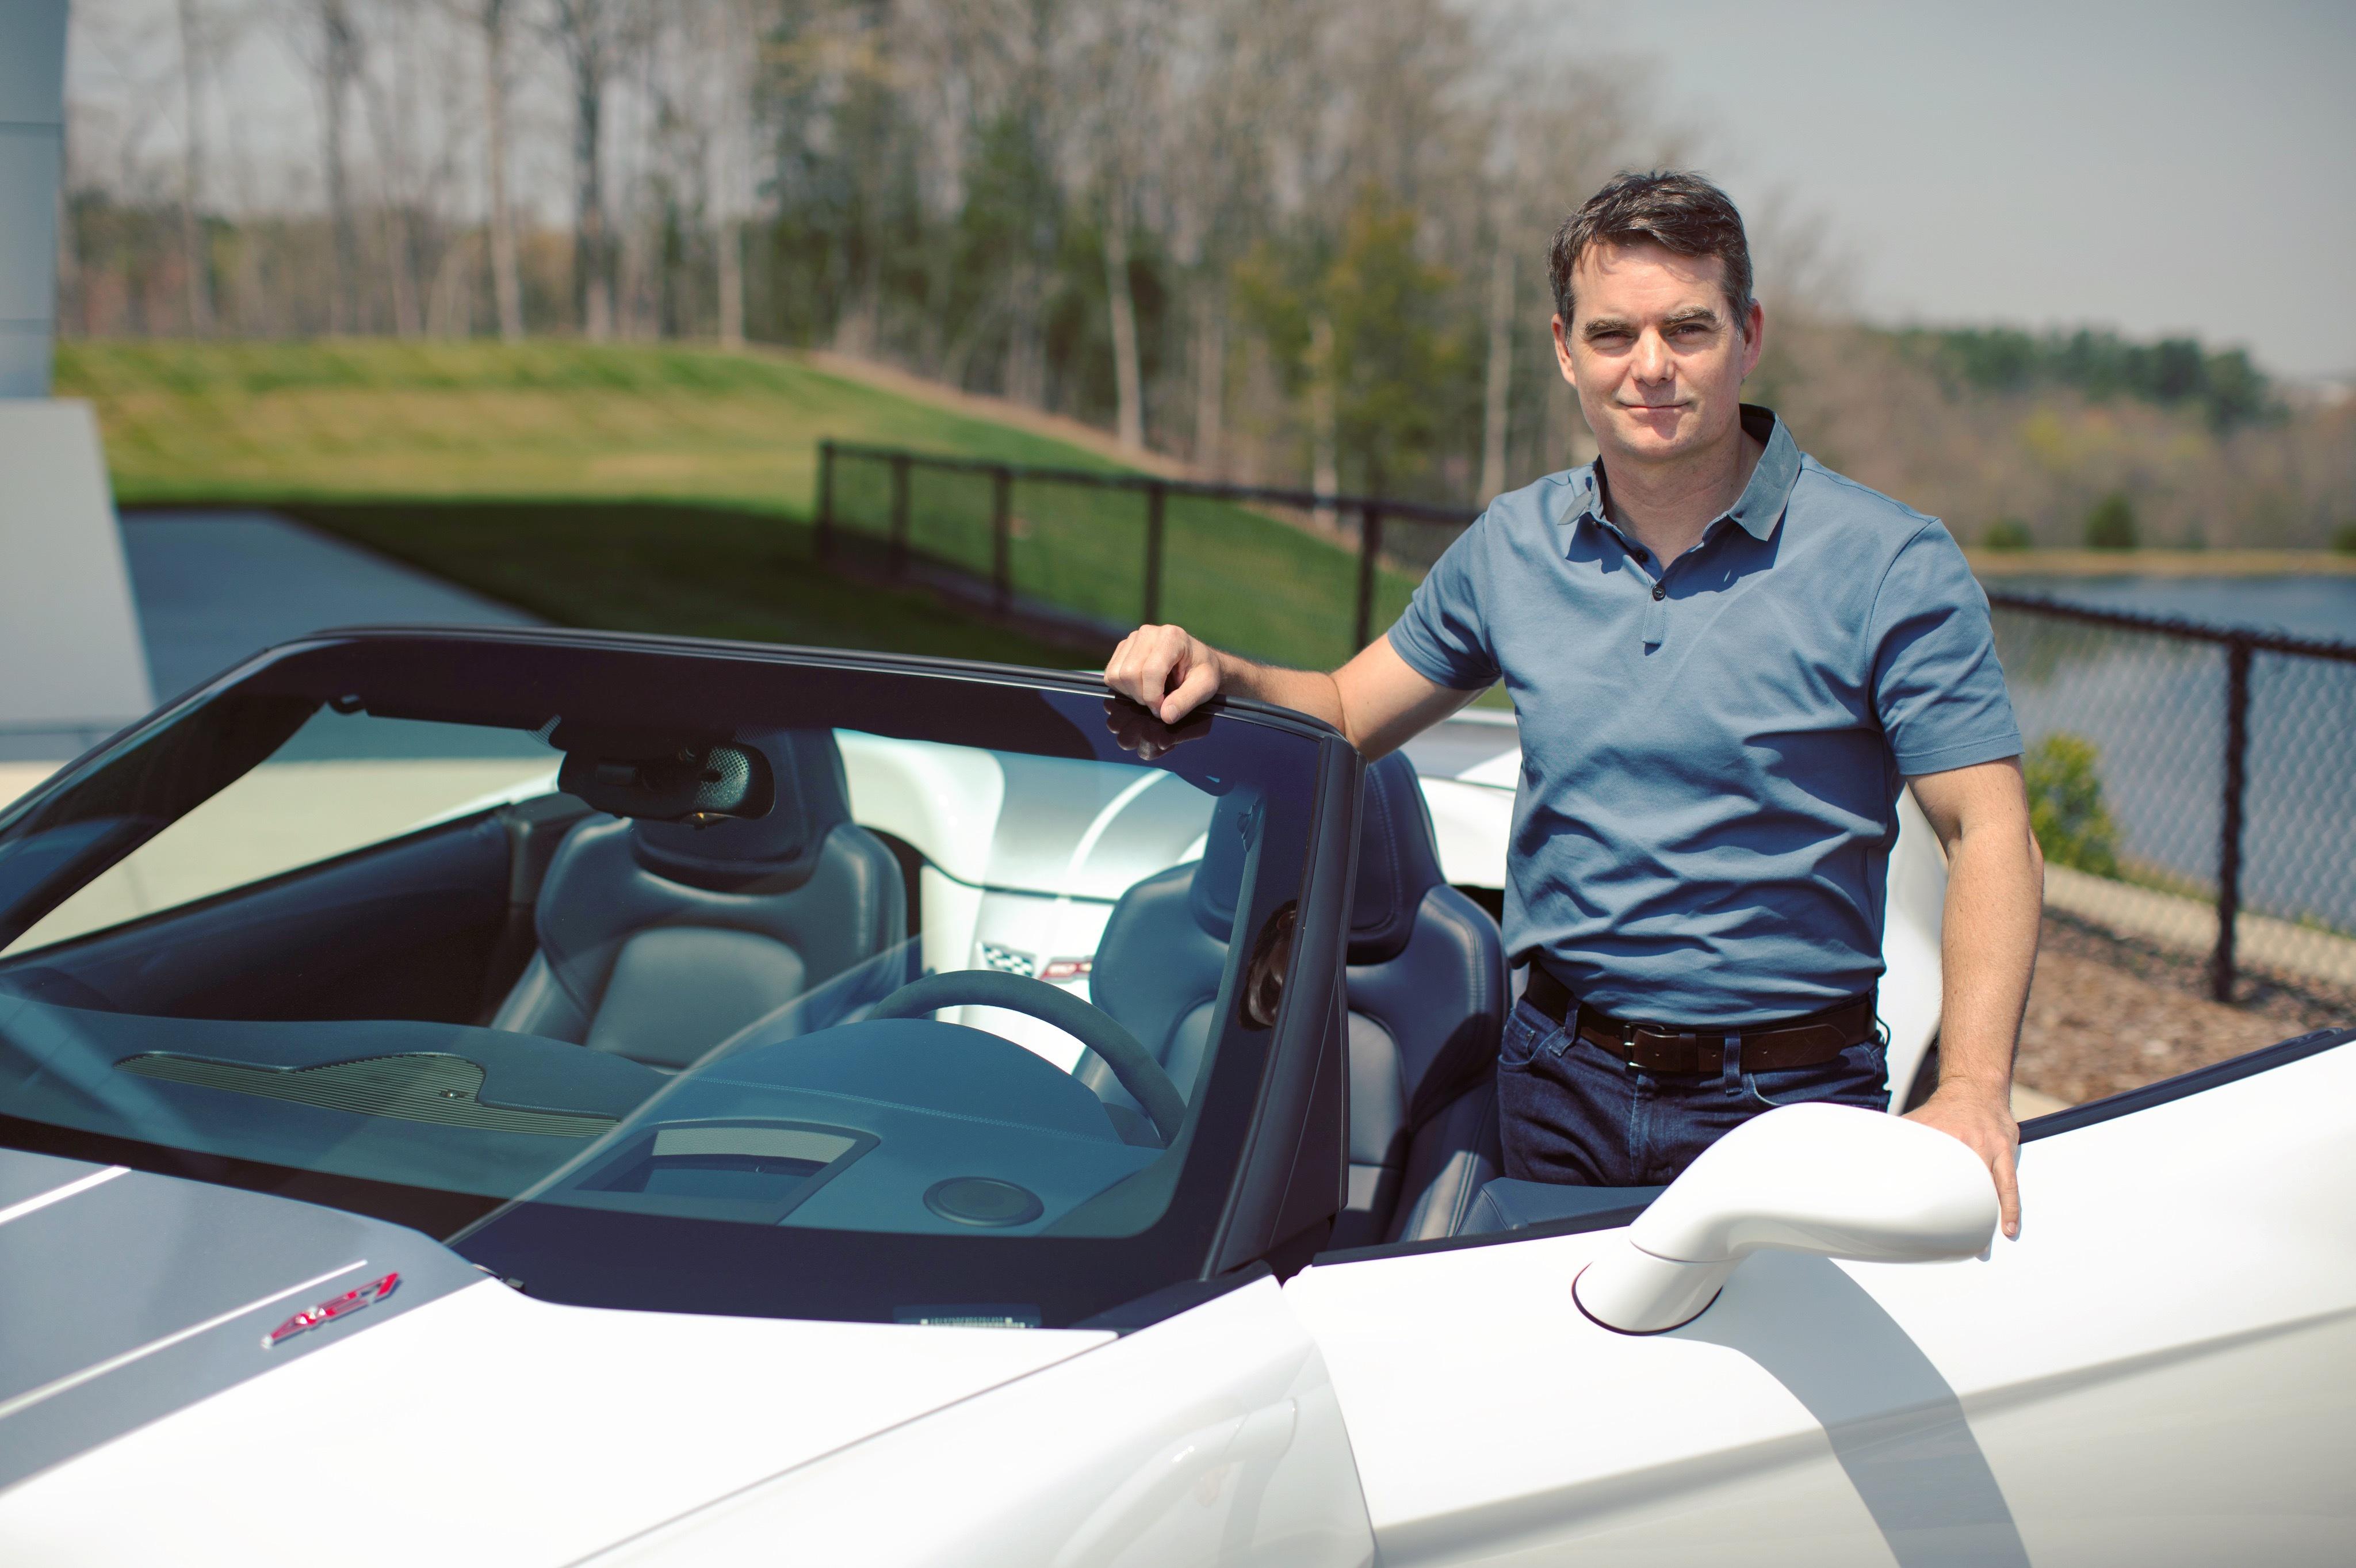 Win the keys to Jeff Gordon's personal Corvette | Hendrick